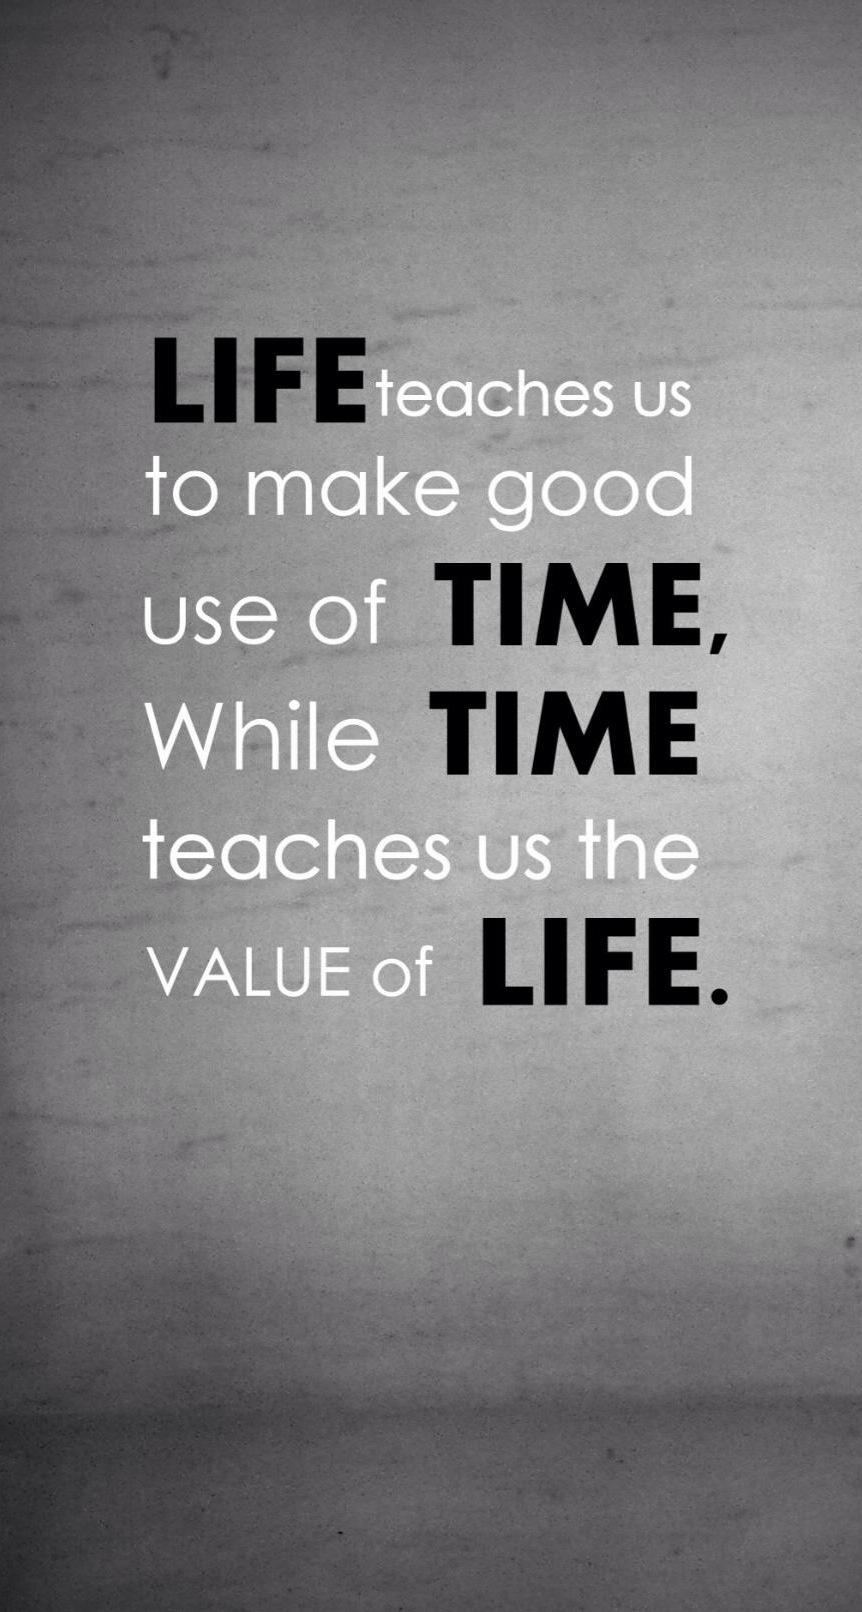 Motivational Wallpaper on Life Life teaches us to make good 862x1612